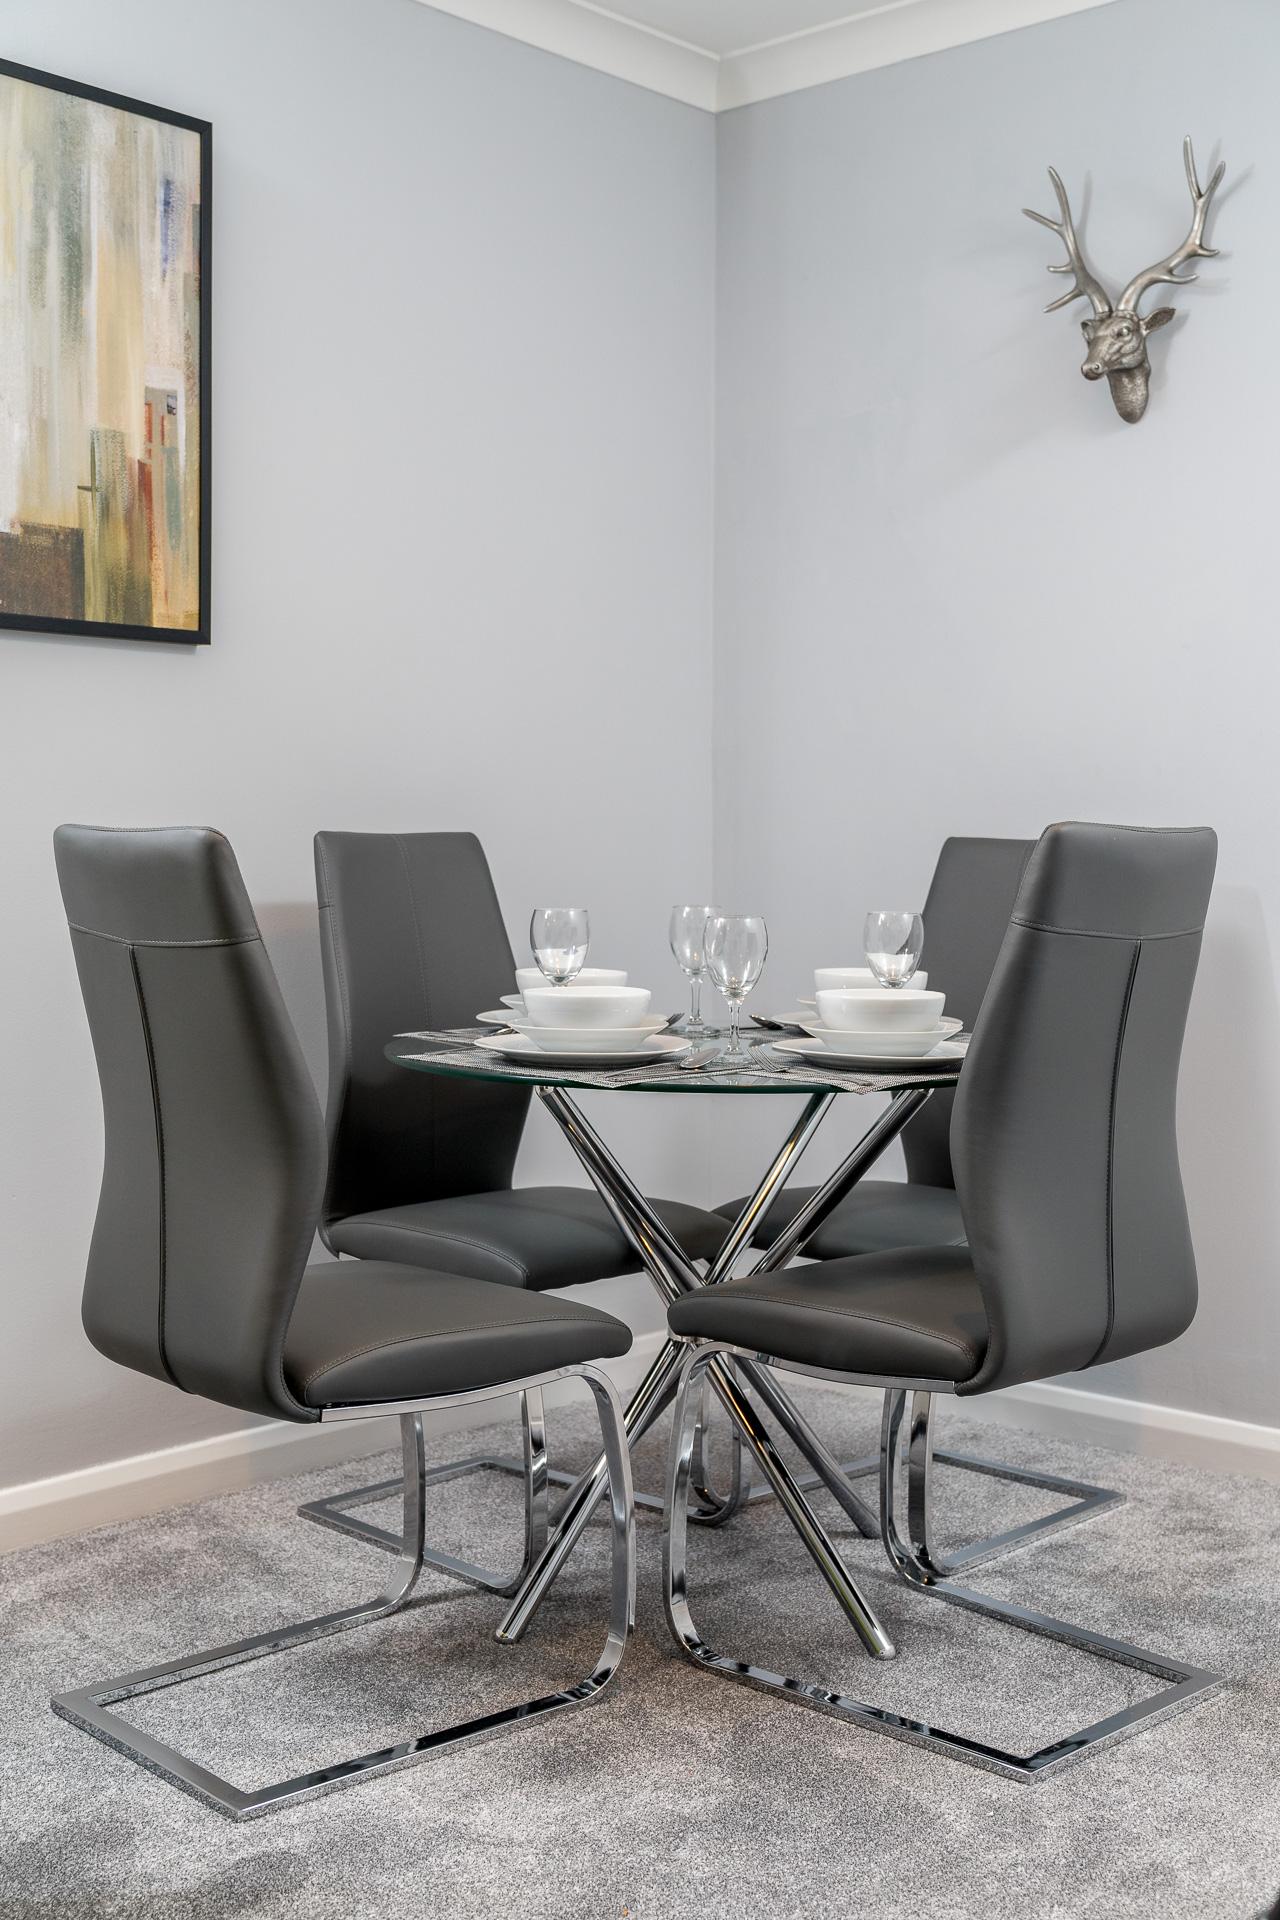 Dining area at Crawley Centre Apartment, Southgate, Crawley